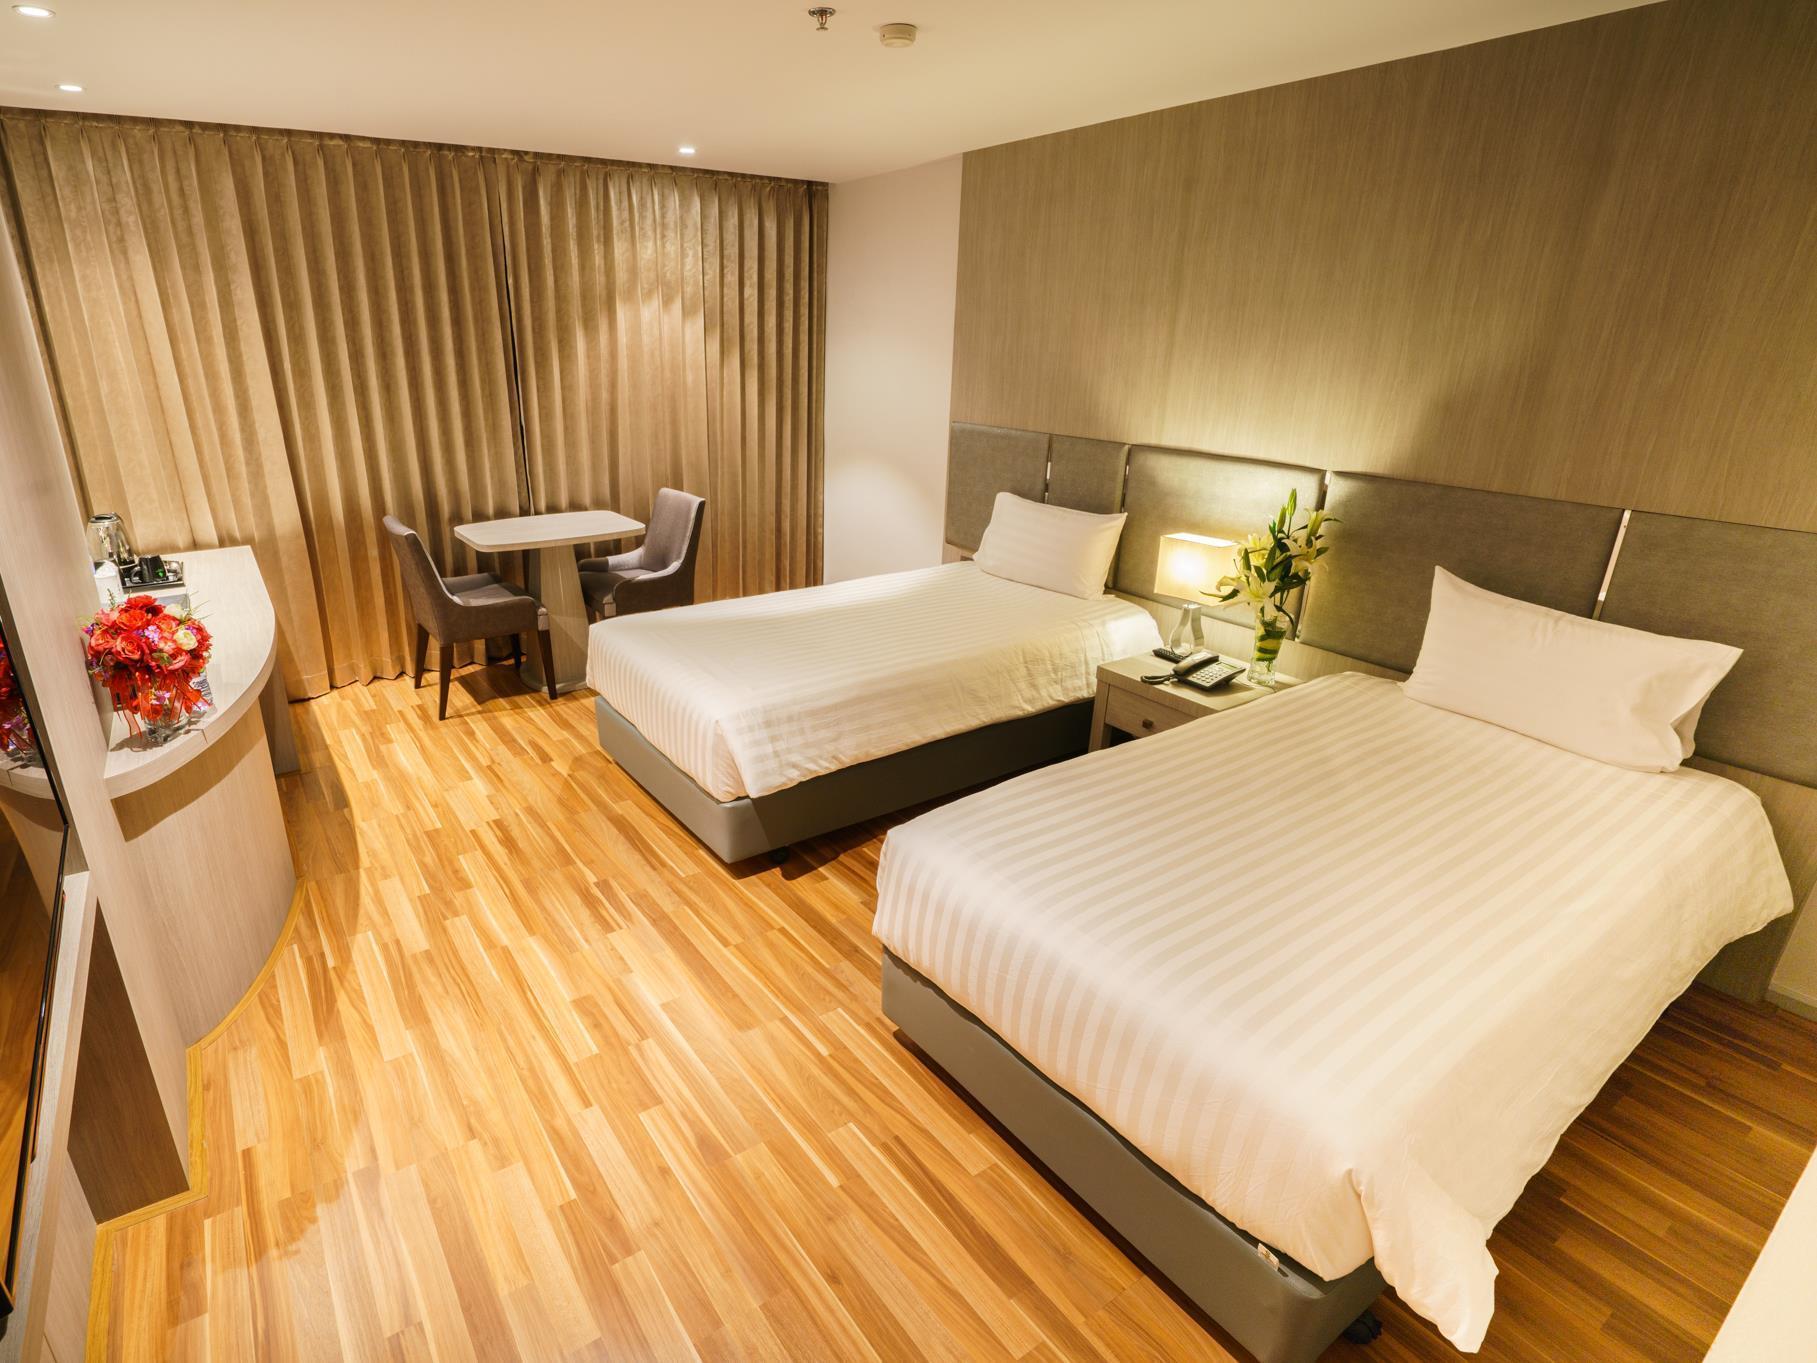 New Season Square Hotel โรงแรมนิว ซีซั่น สแควร์